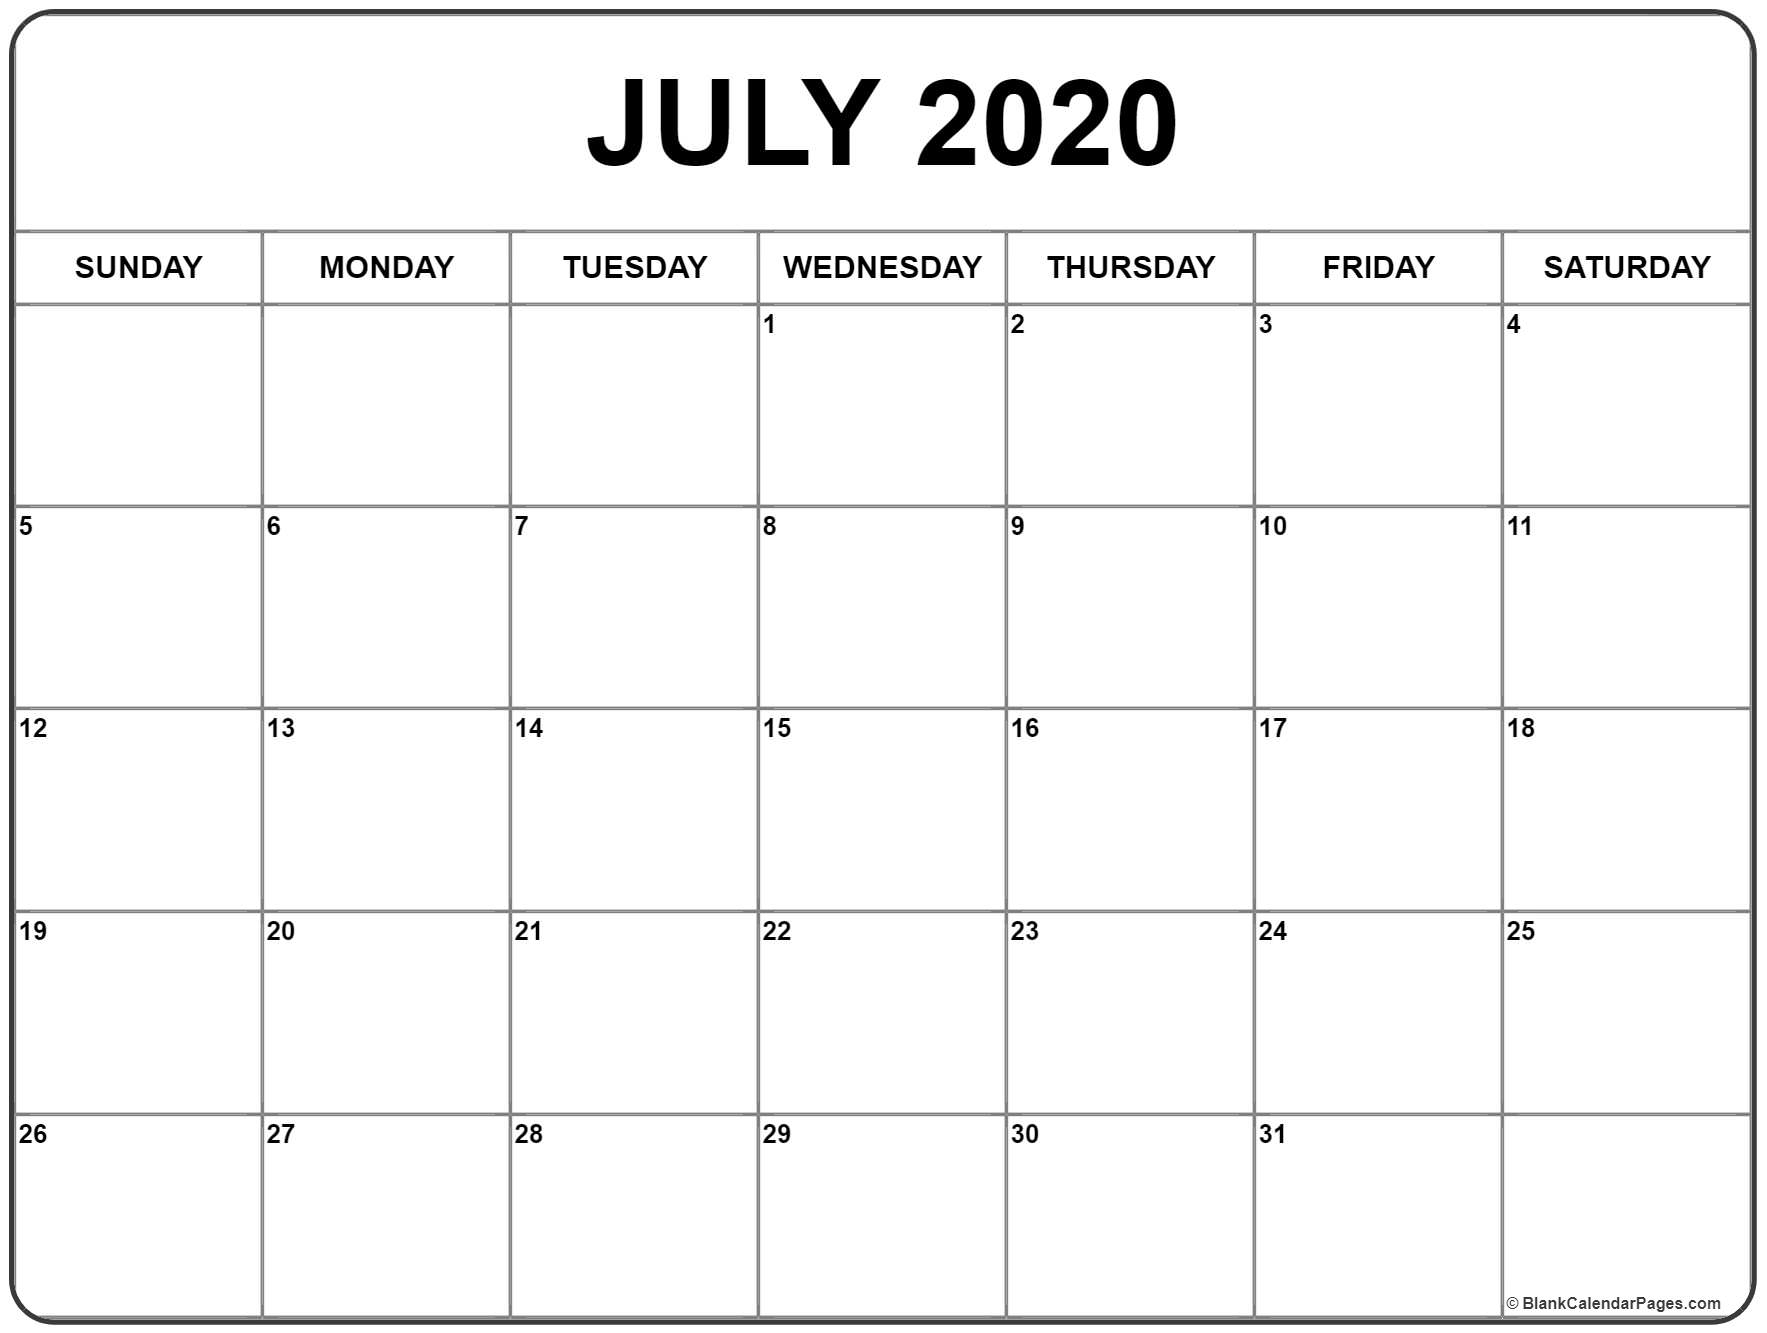 July 2020 Calendar | Free Printable Monthly Calendars inside Printable Coloring Calendar 2020